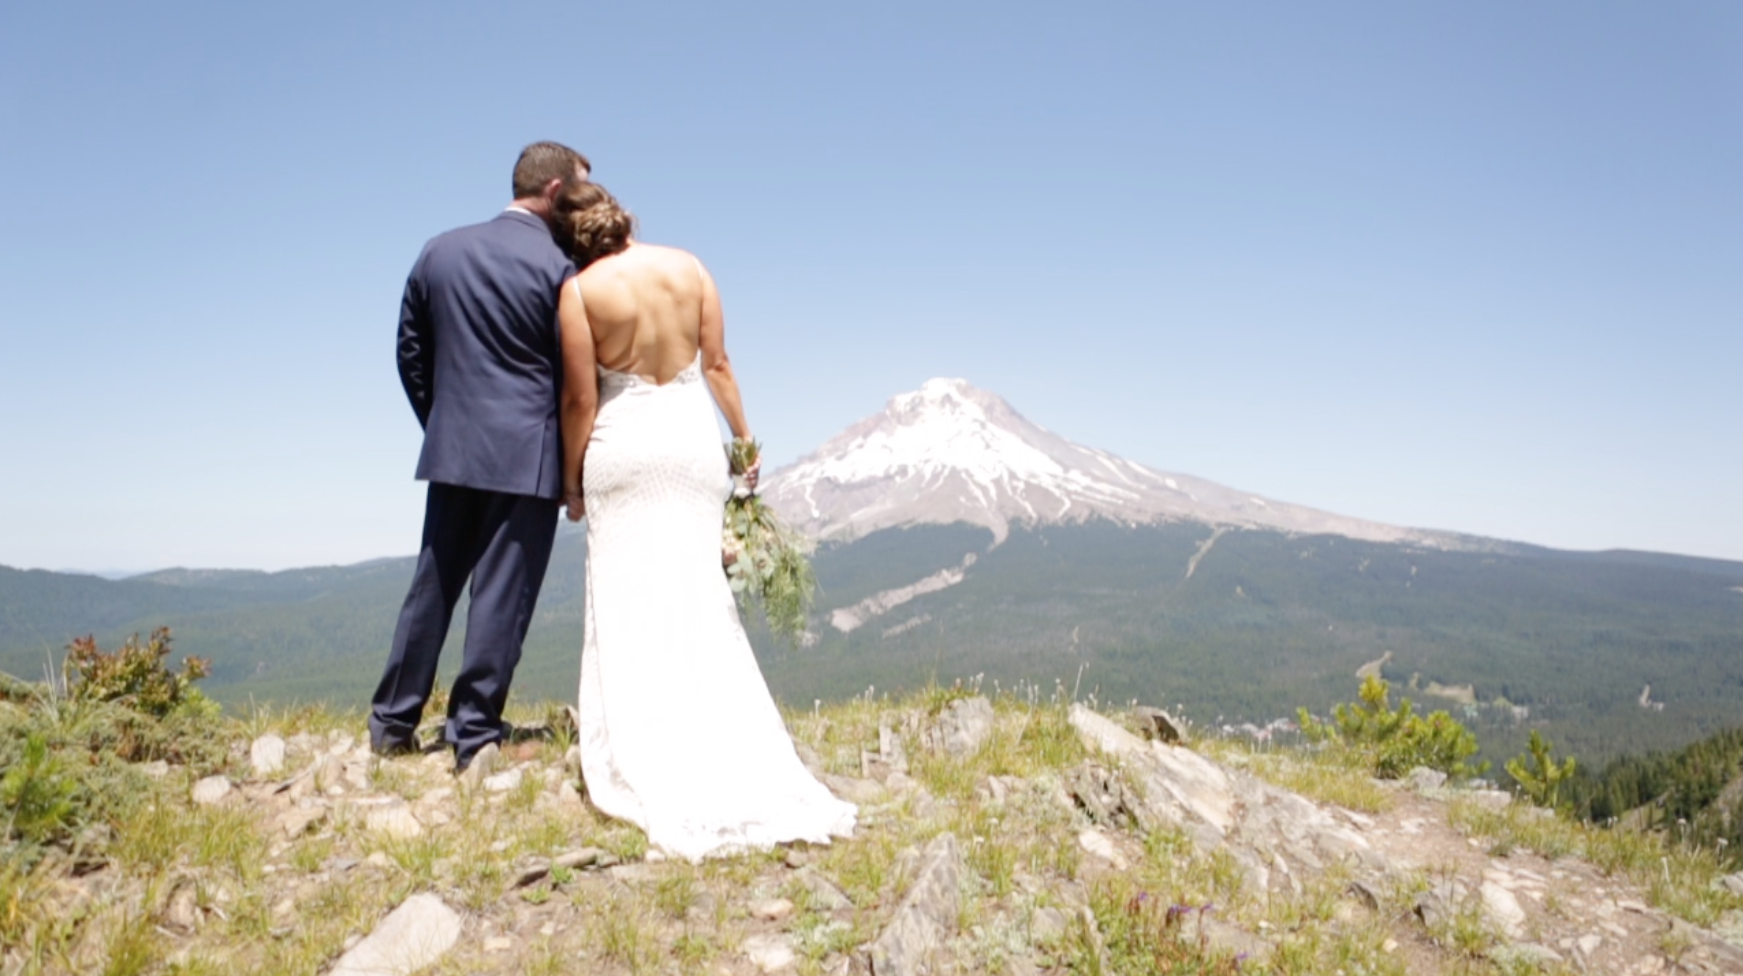 Kevin + Kendra | Mount Hood, Oregon | Mt. Hood